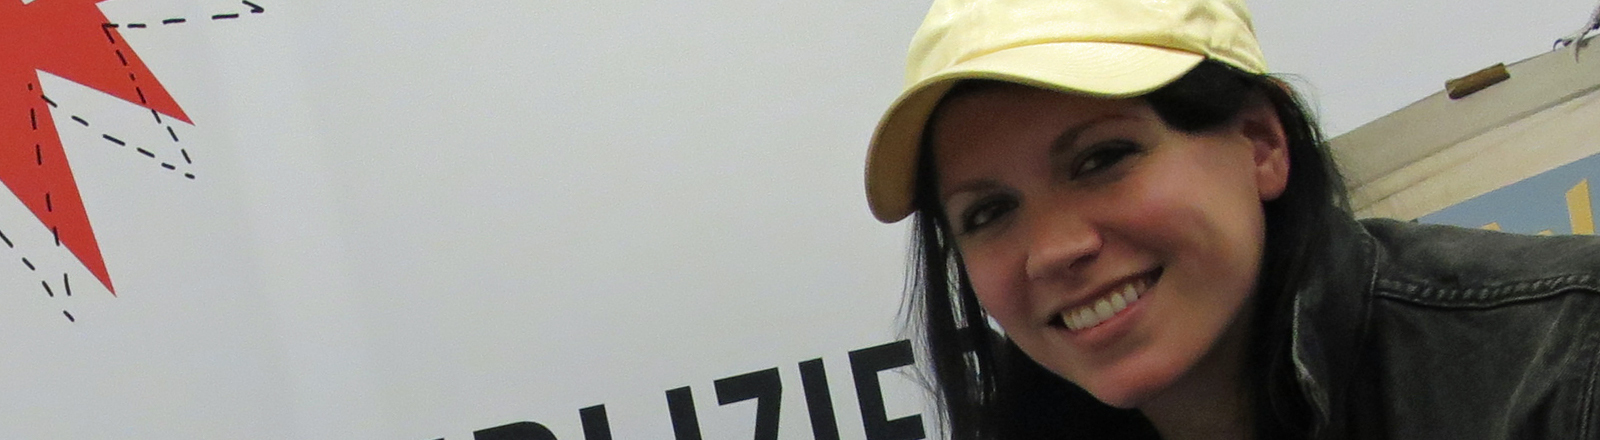 Bei Deutschlandfunk-Nova-Moderatorin Tina Kießling ist K.Flay zu Gast.